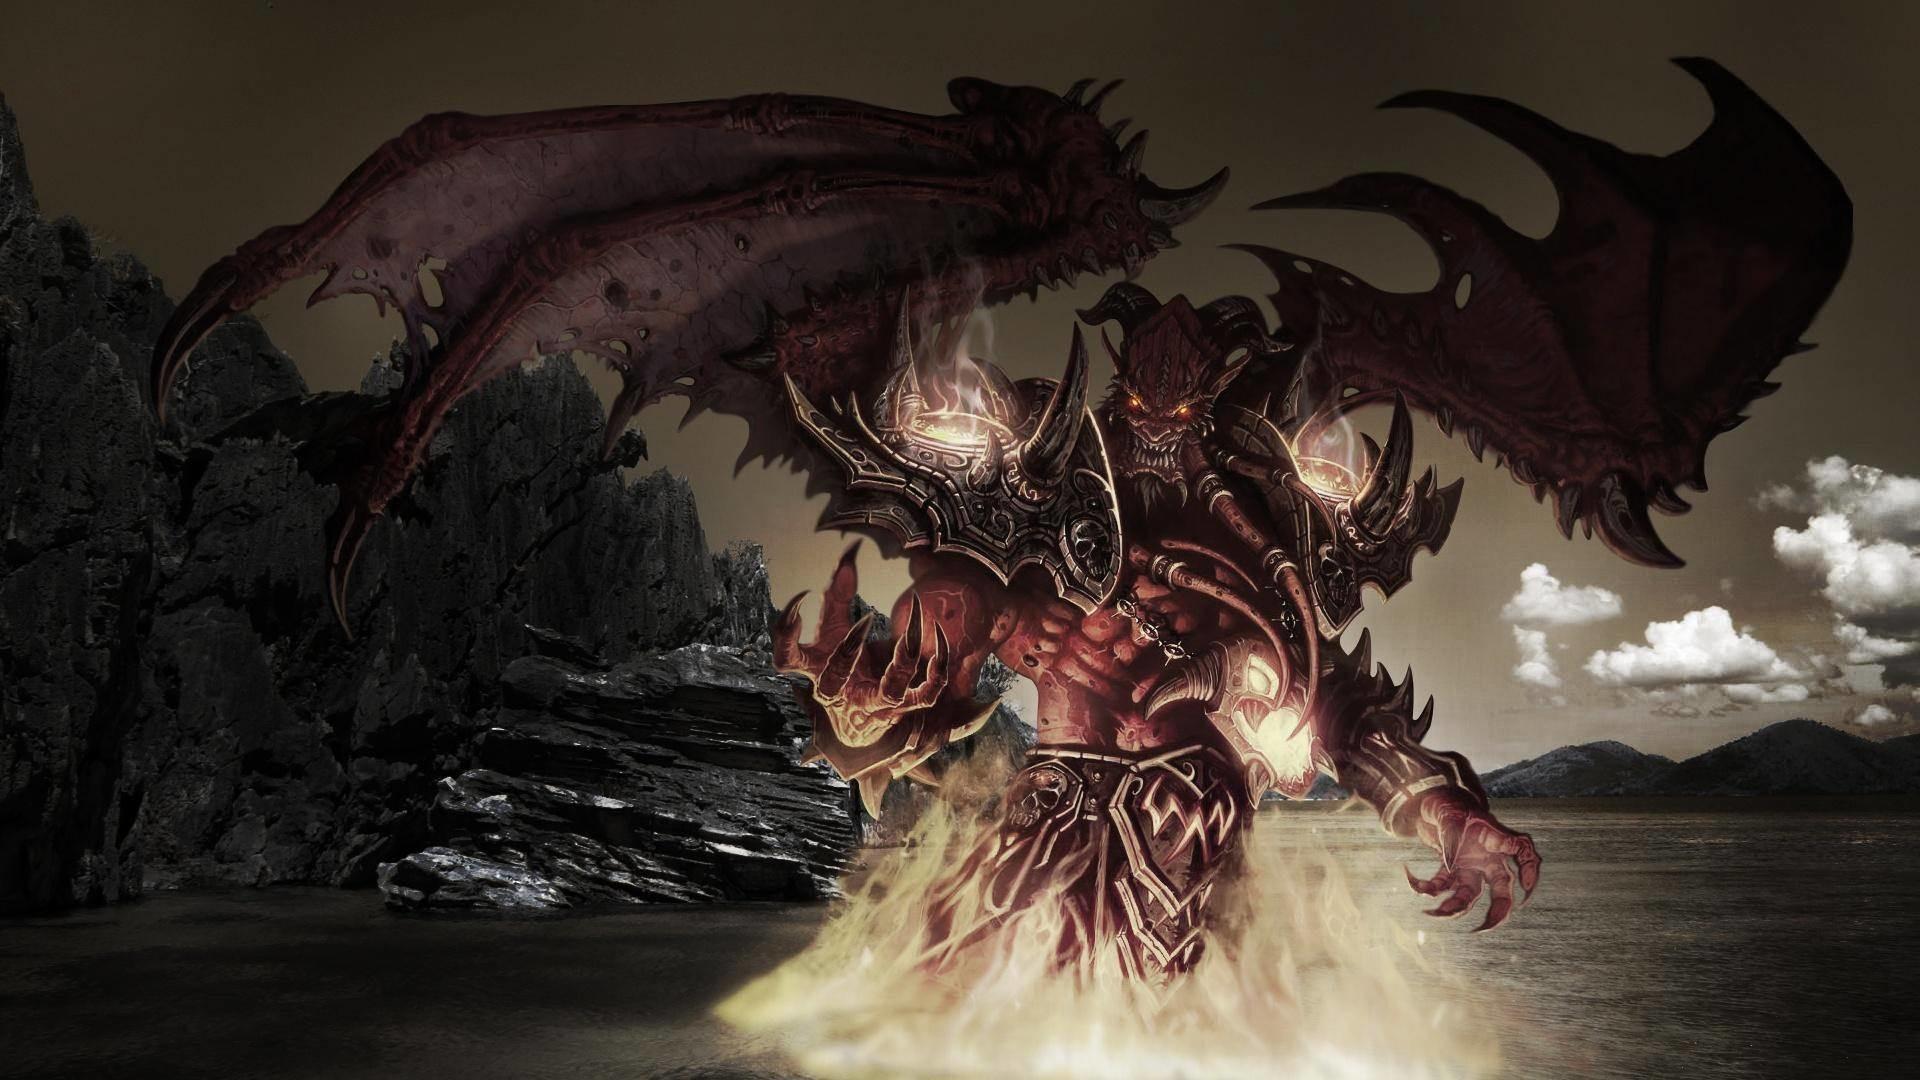 World of Warcraft Devil's Advocate Wallpaper